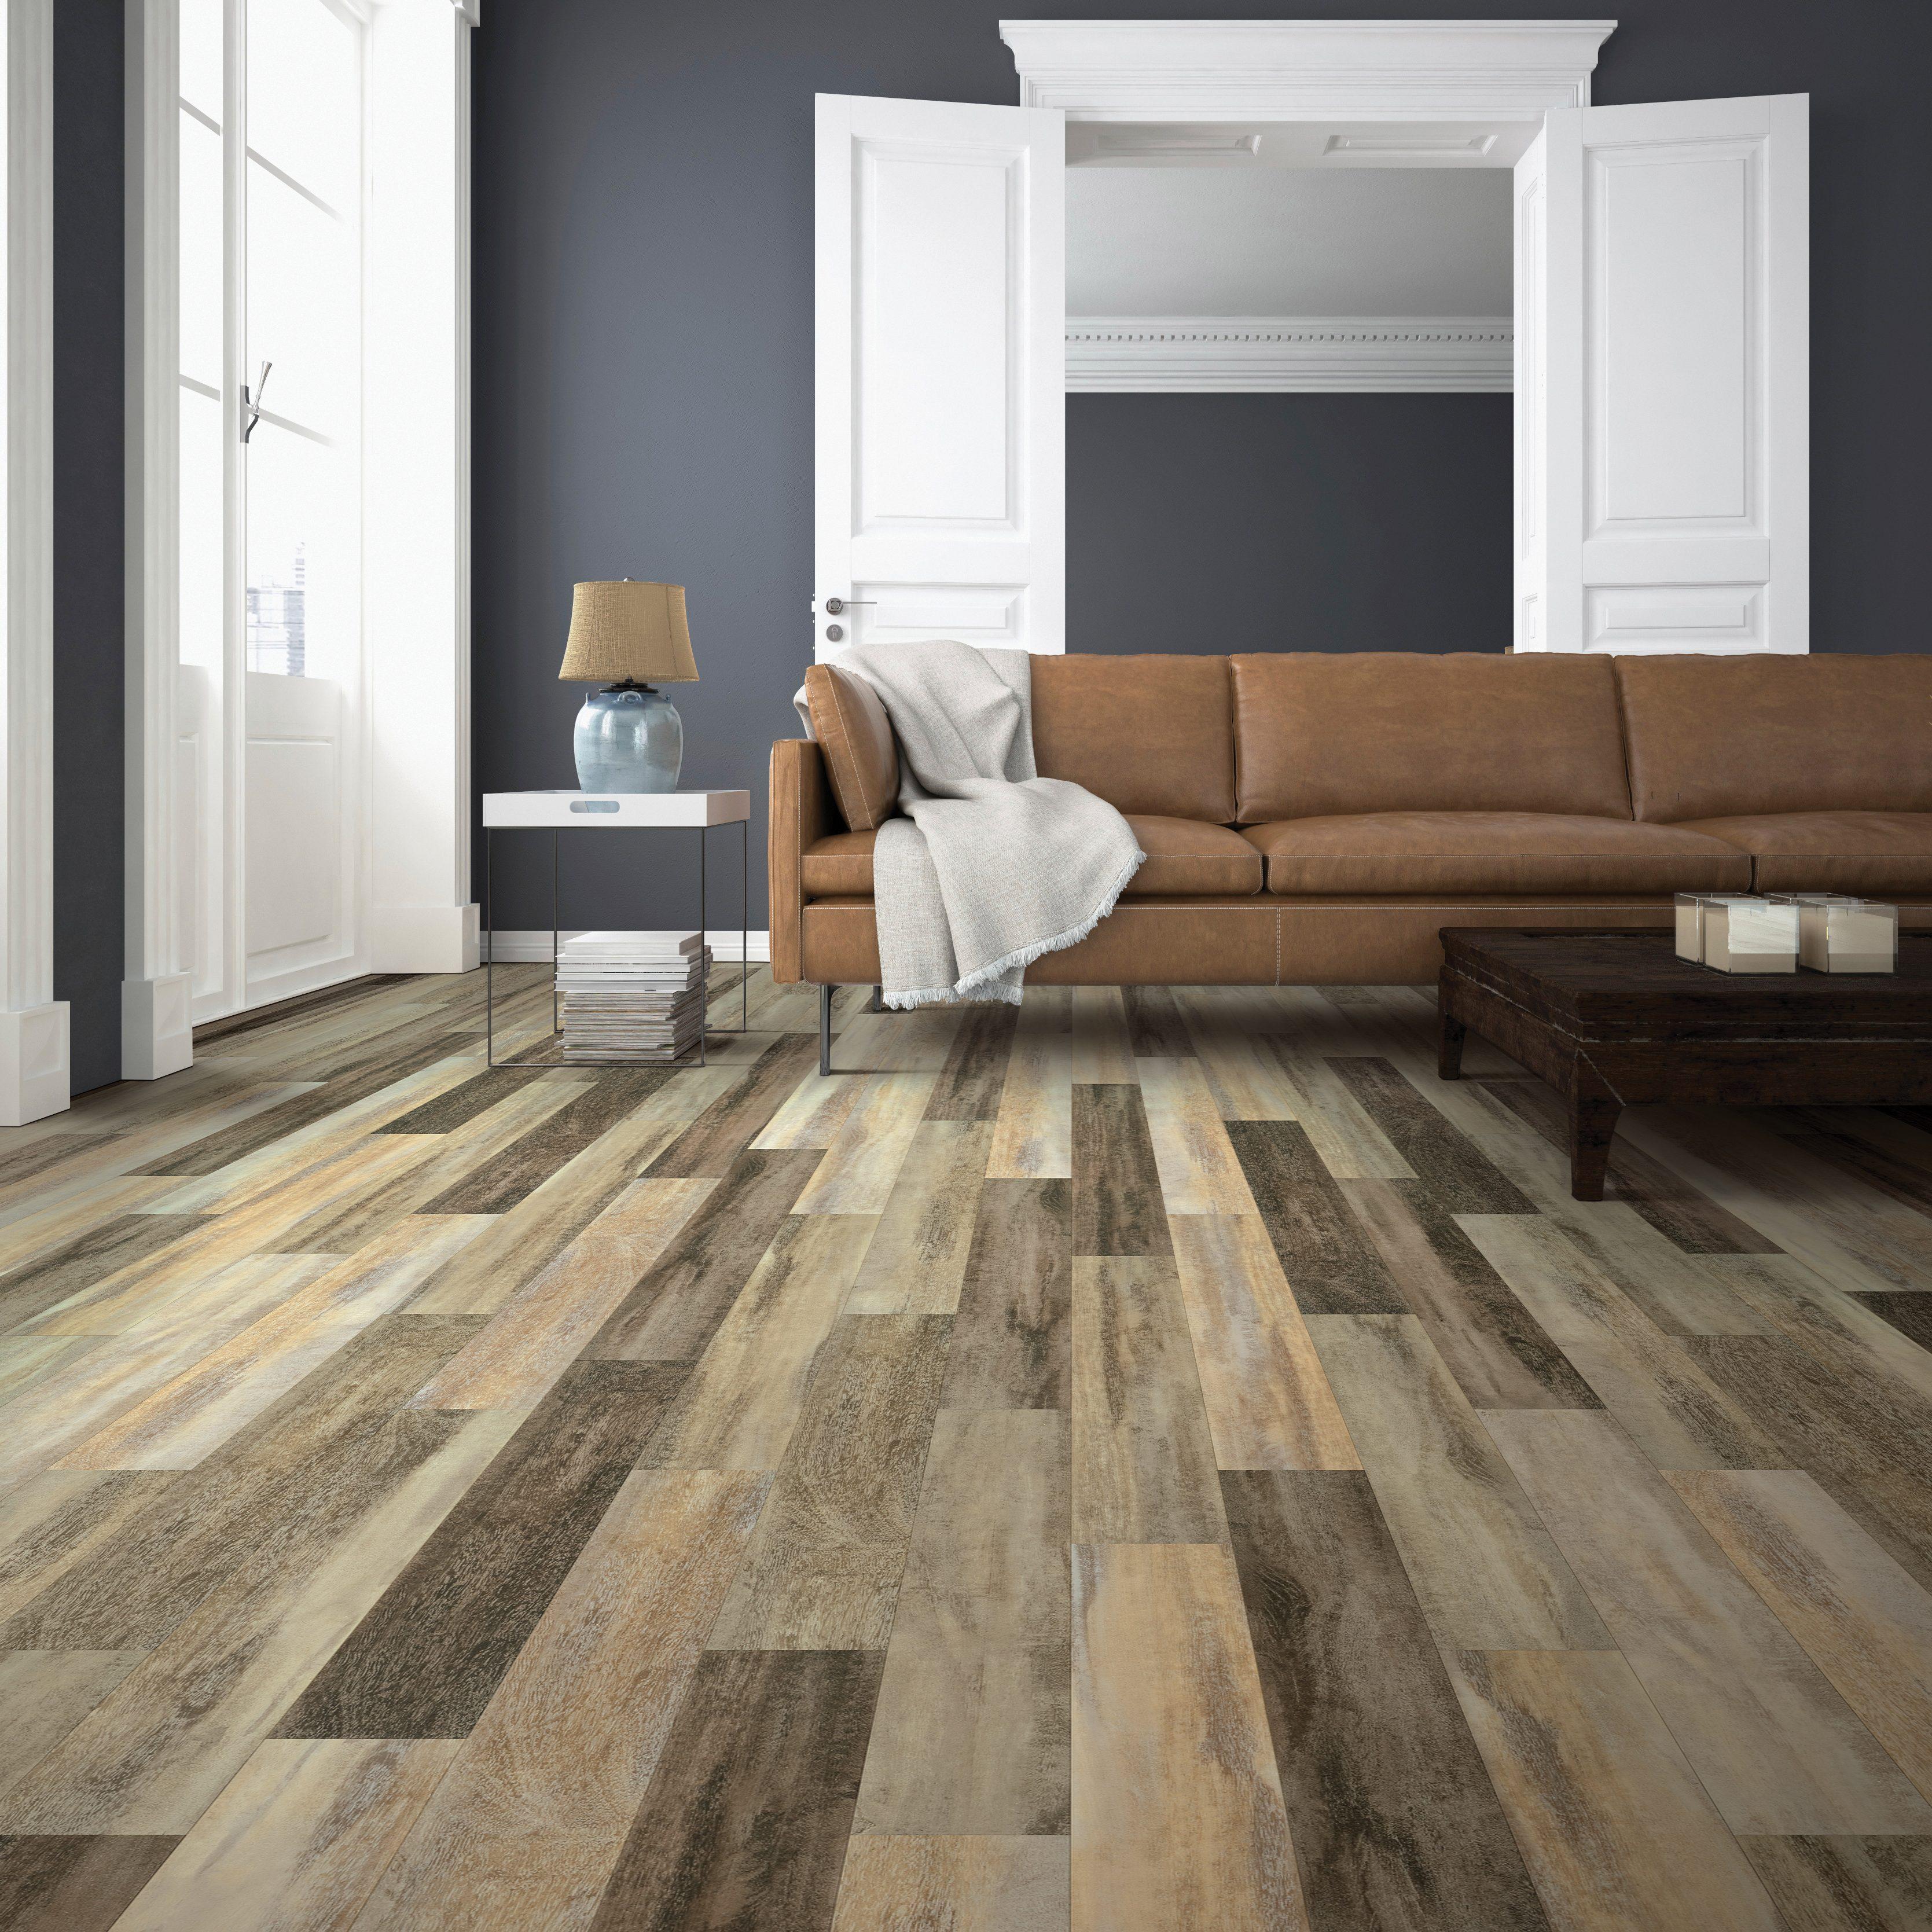 Modern living room flooring | Degraaf Interiors